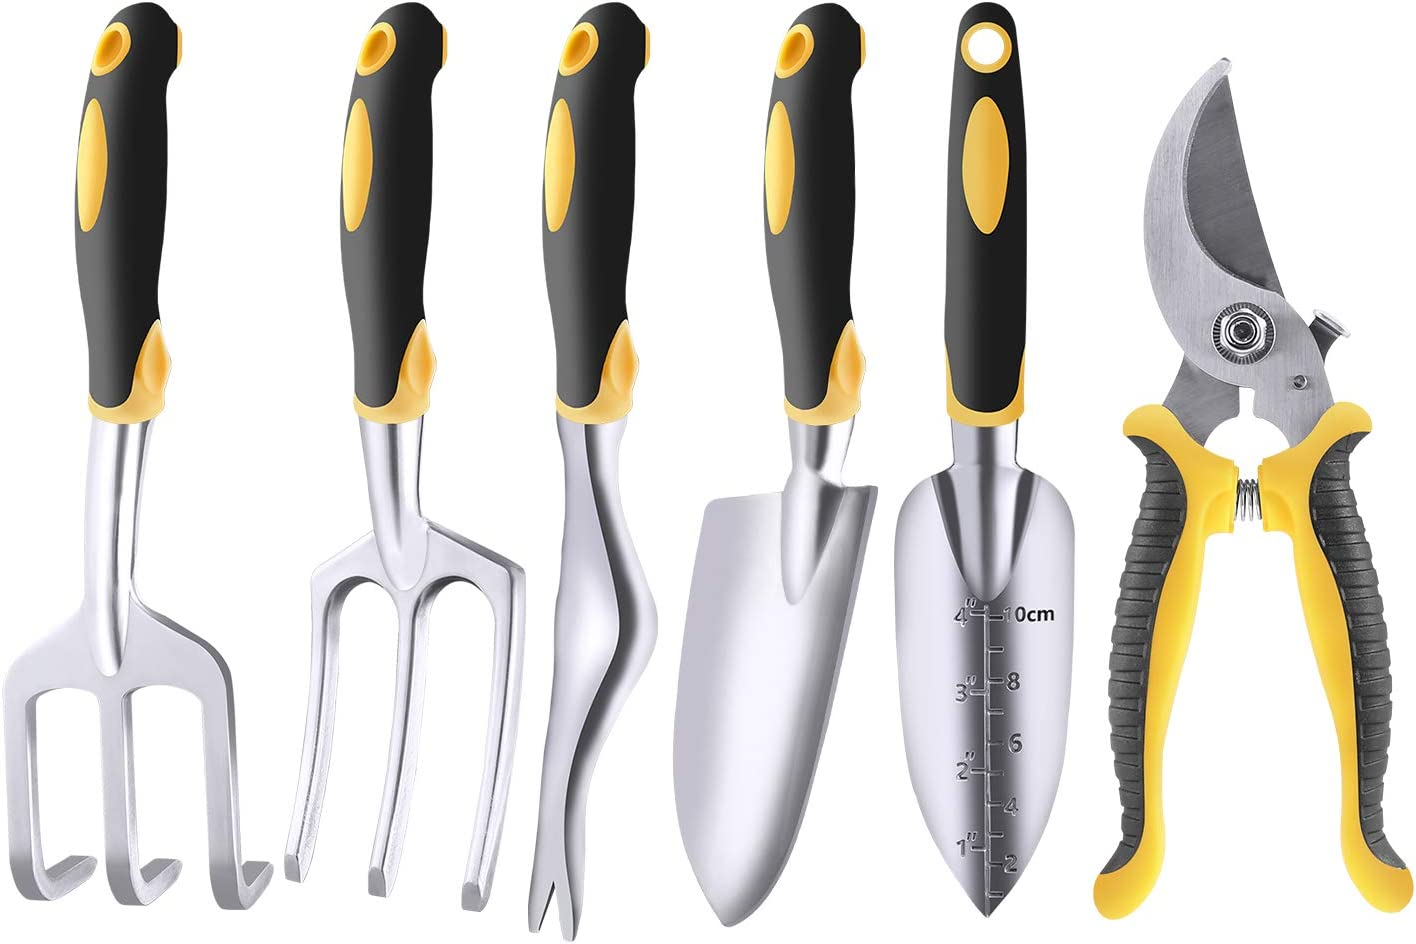 LARAH Garden Hand Tool Sets, 6Pcs Aluminum Heavy Duty Garden Hand Tool Kits for Weeding, Loosening Soil, Digging, Transplanting and More